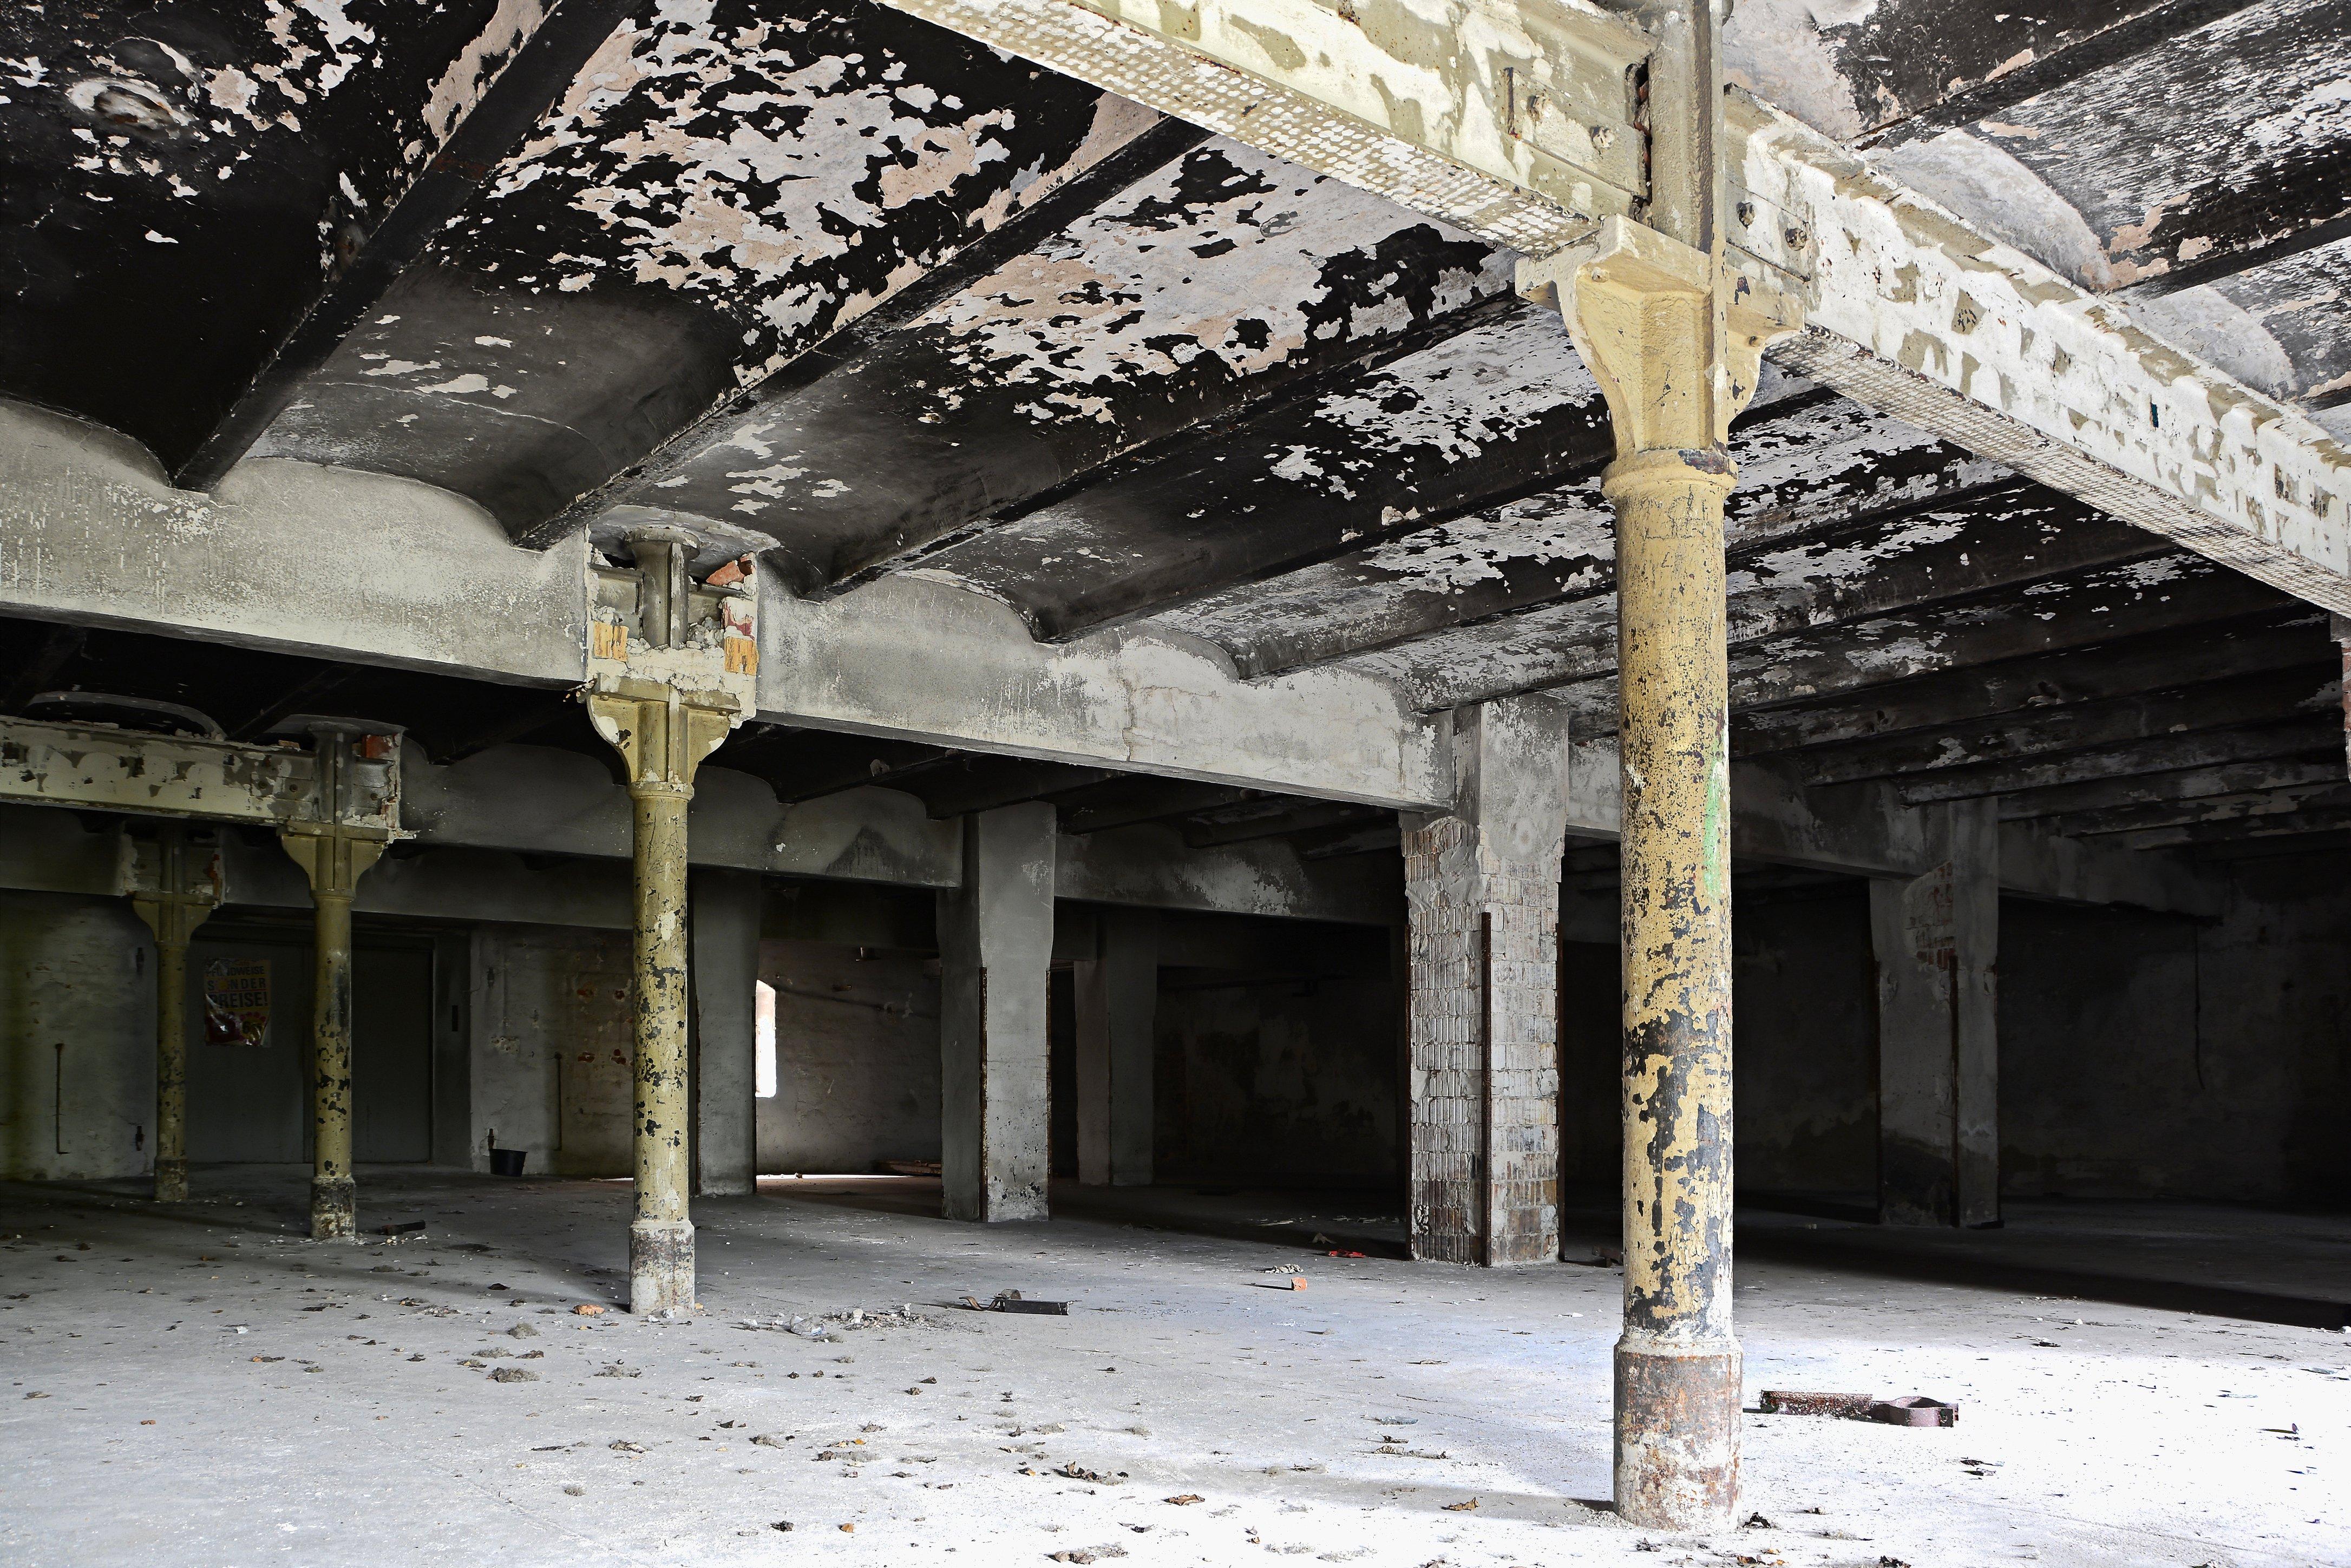 BBJ Group - Brownfield redevelopment